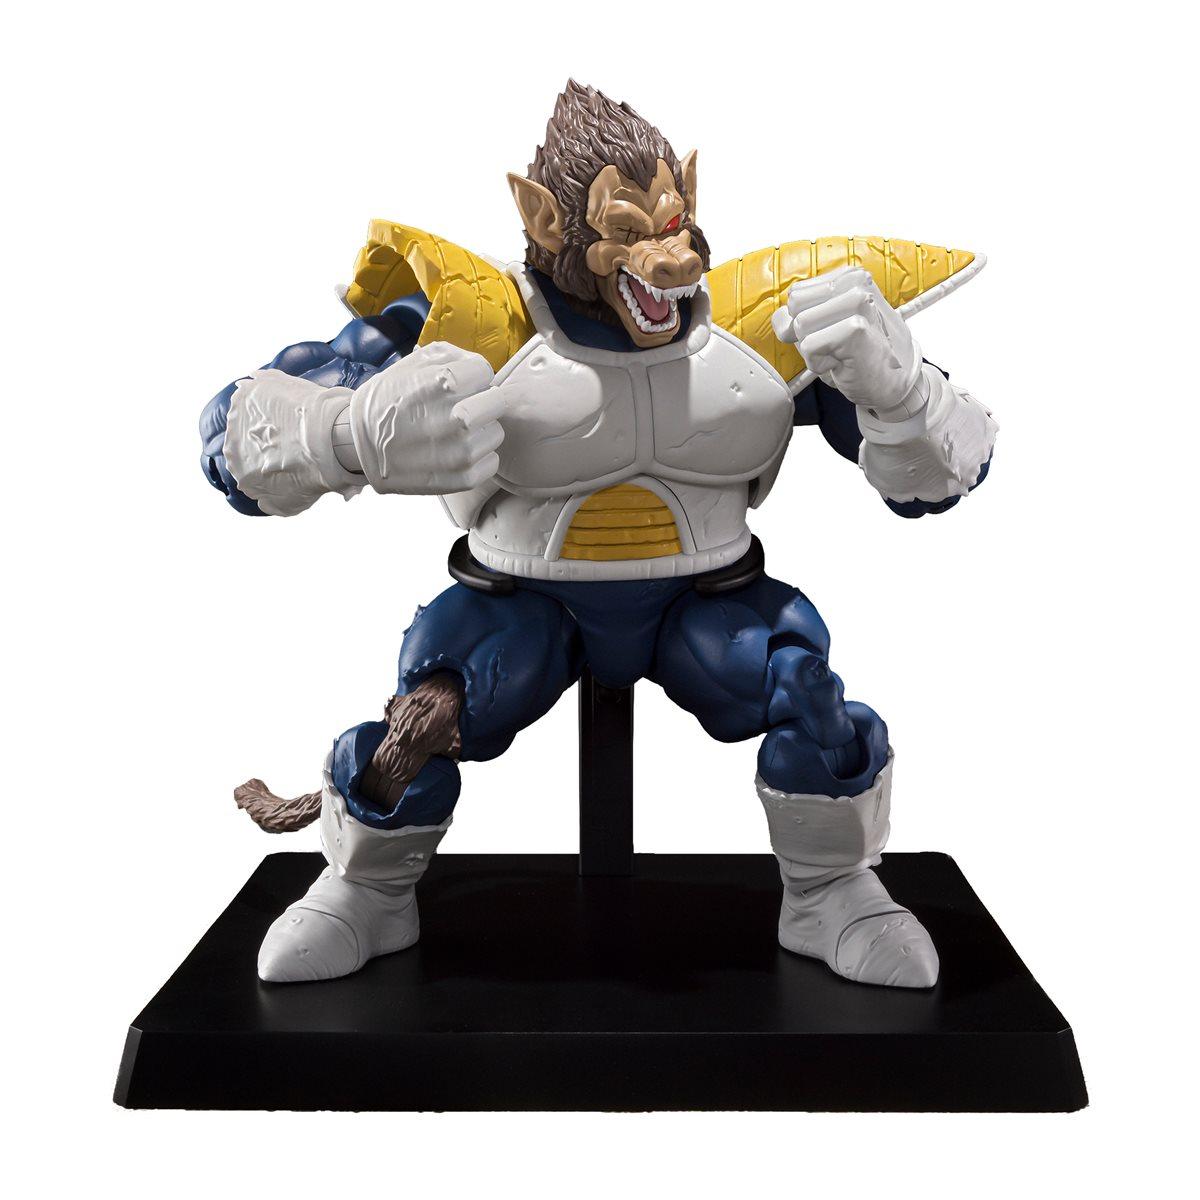 Dragon Ball Z Super Saiyan Great Ape Vegeta Figuration Battle Figure Anime Toy